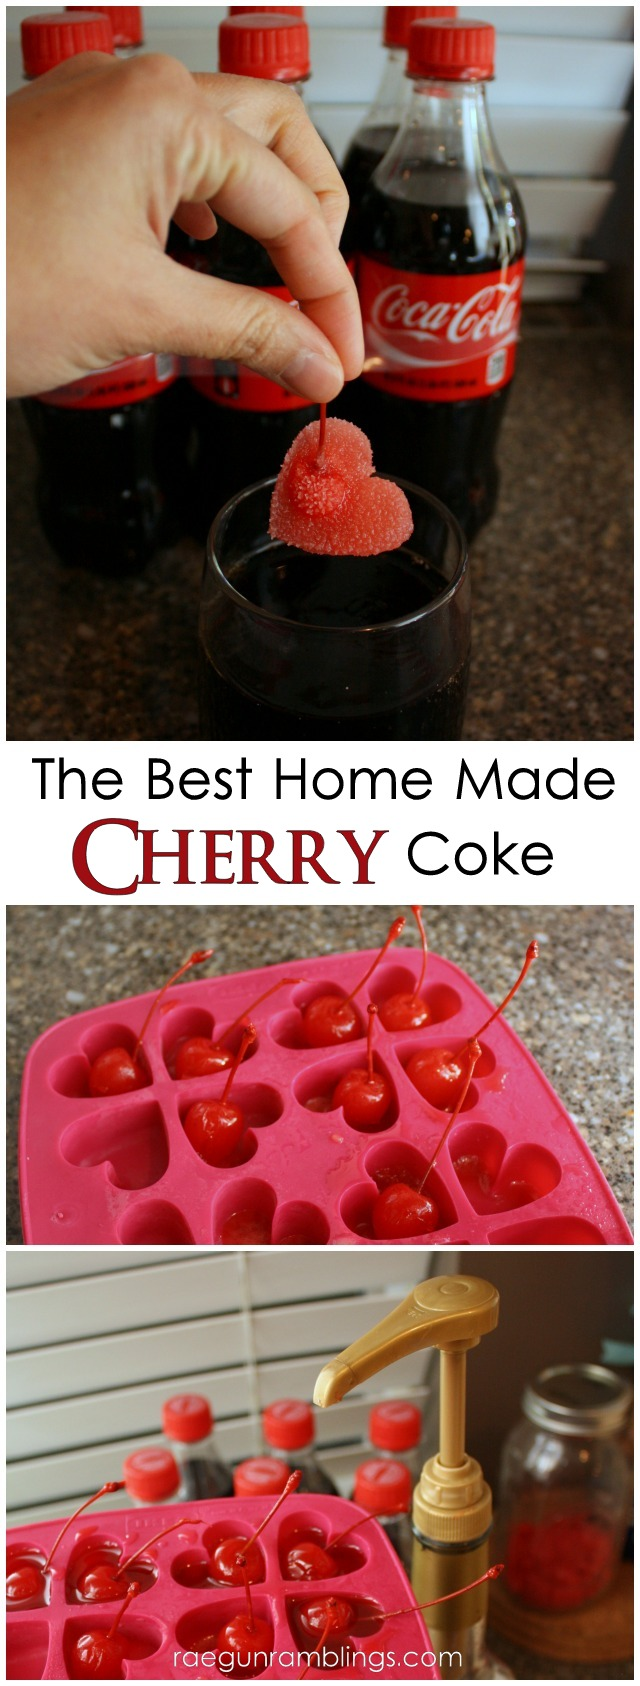 The secret to getting the perfect soda shop tasting cherry coke at home - Rae Gun Ramblings